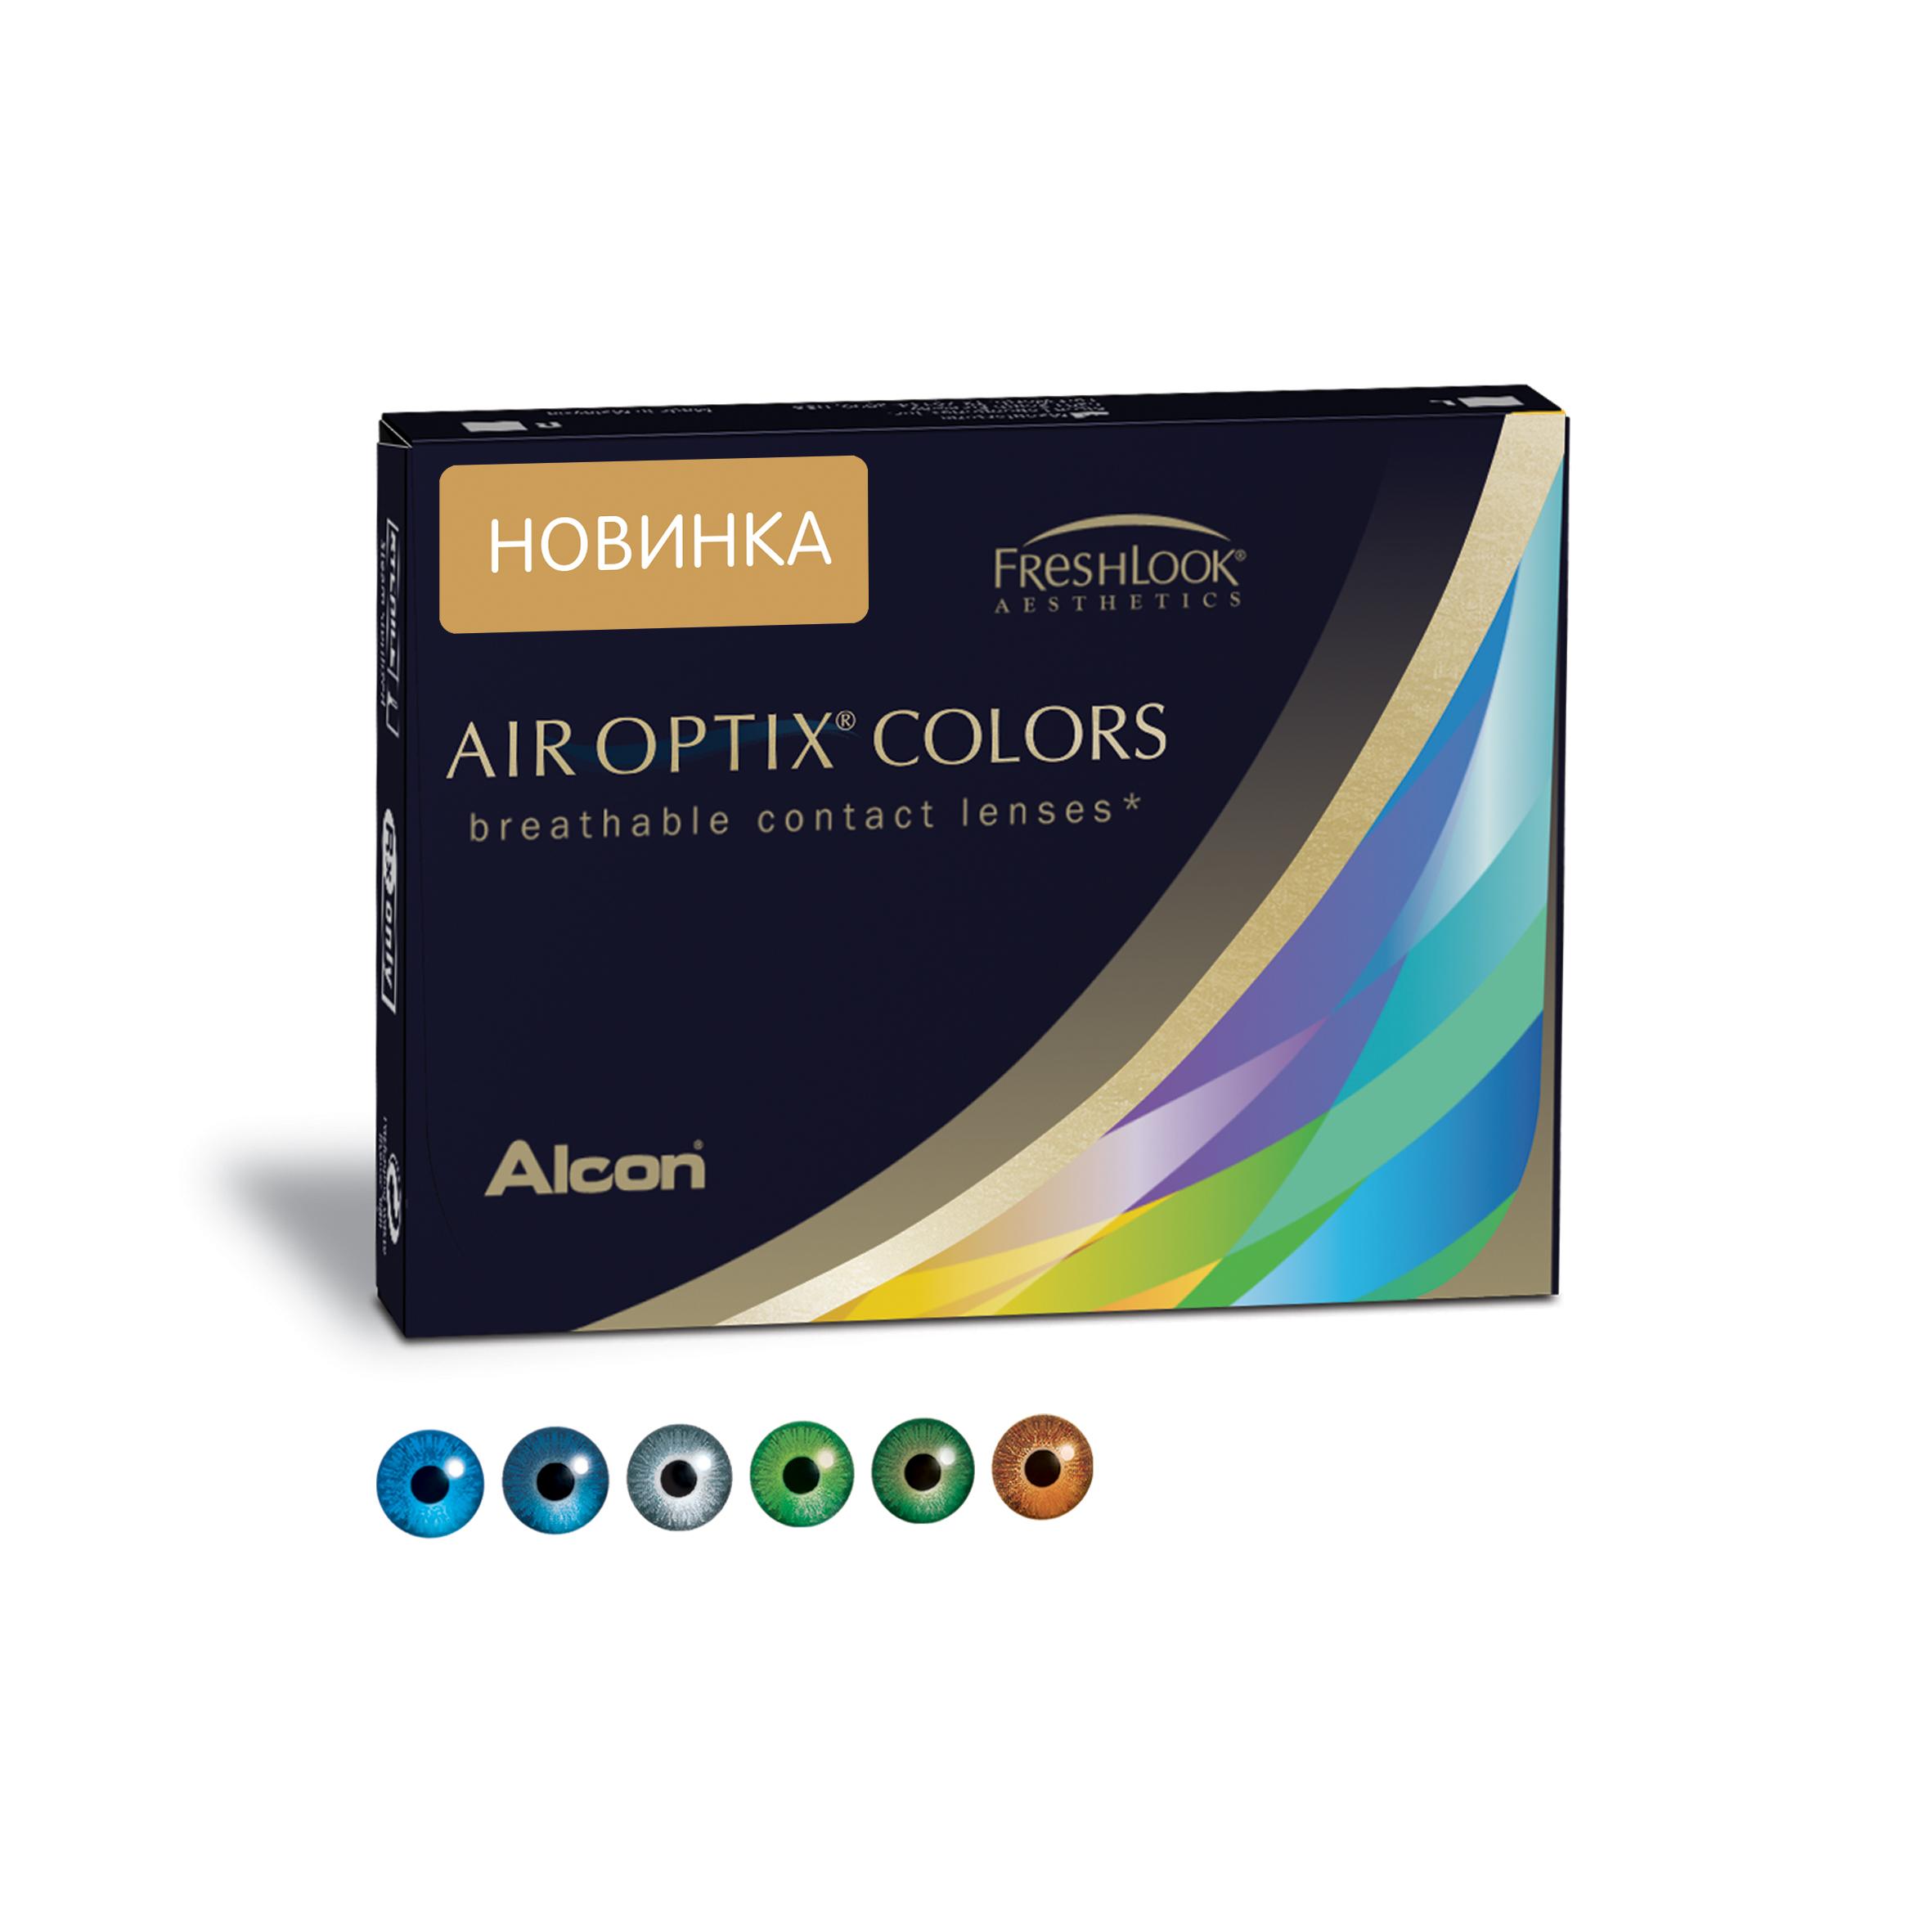 Аlcon контактные линзы Air Optix Colors 2 шт -6.00 Sterling Gray